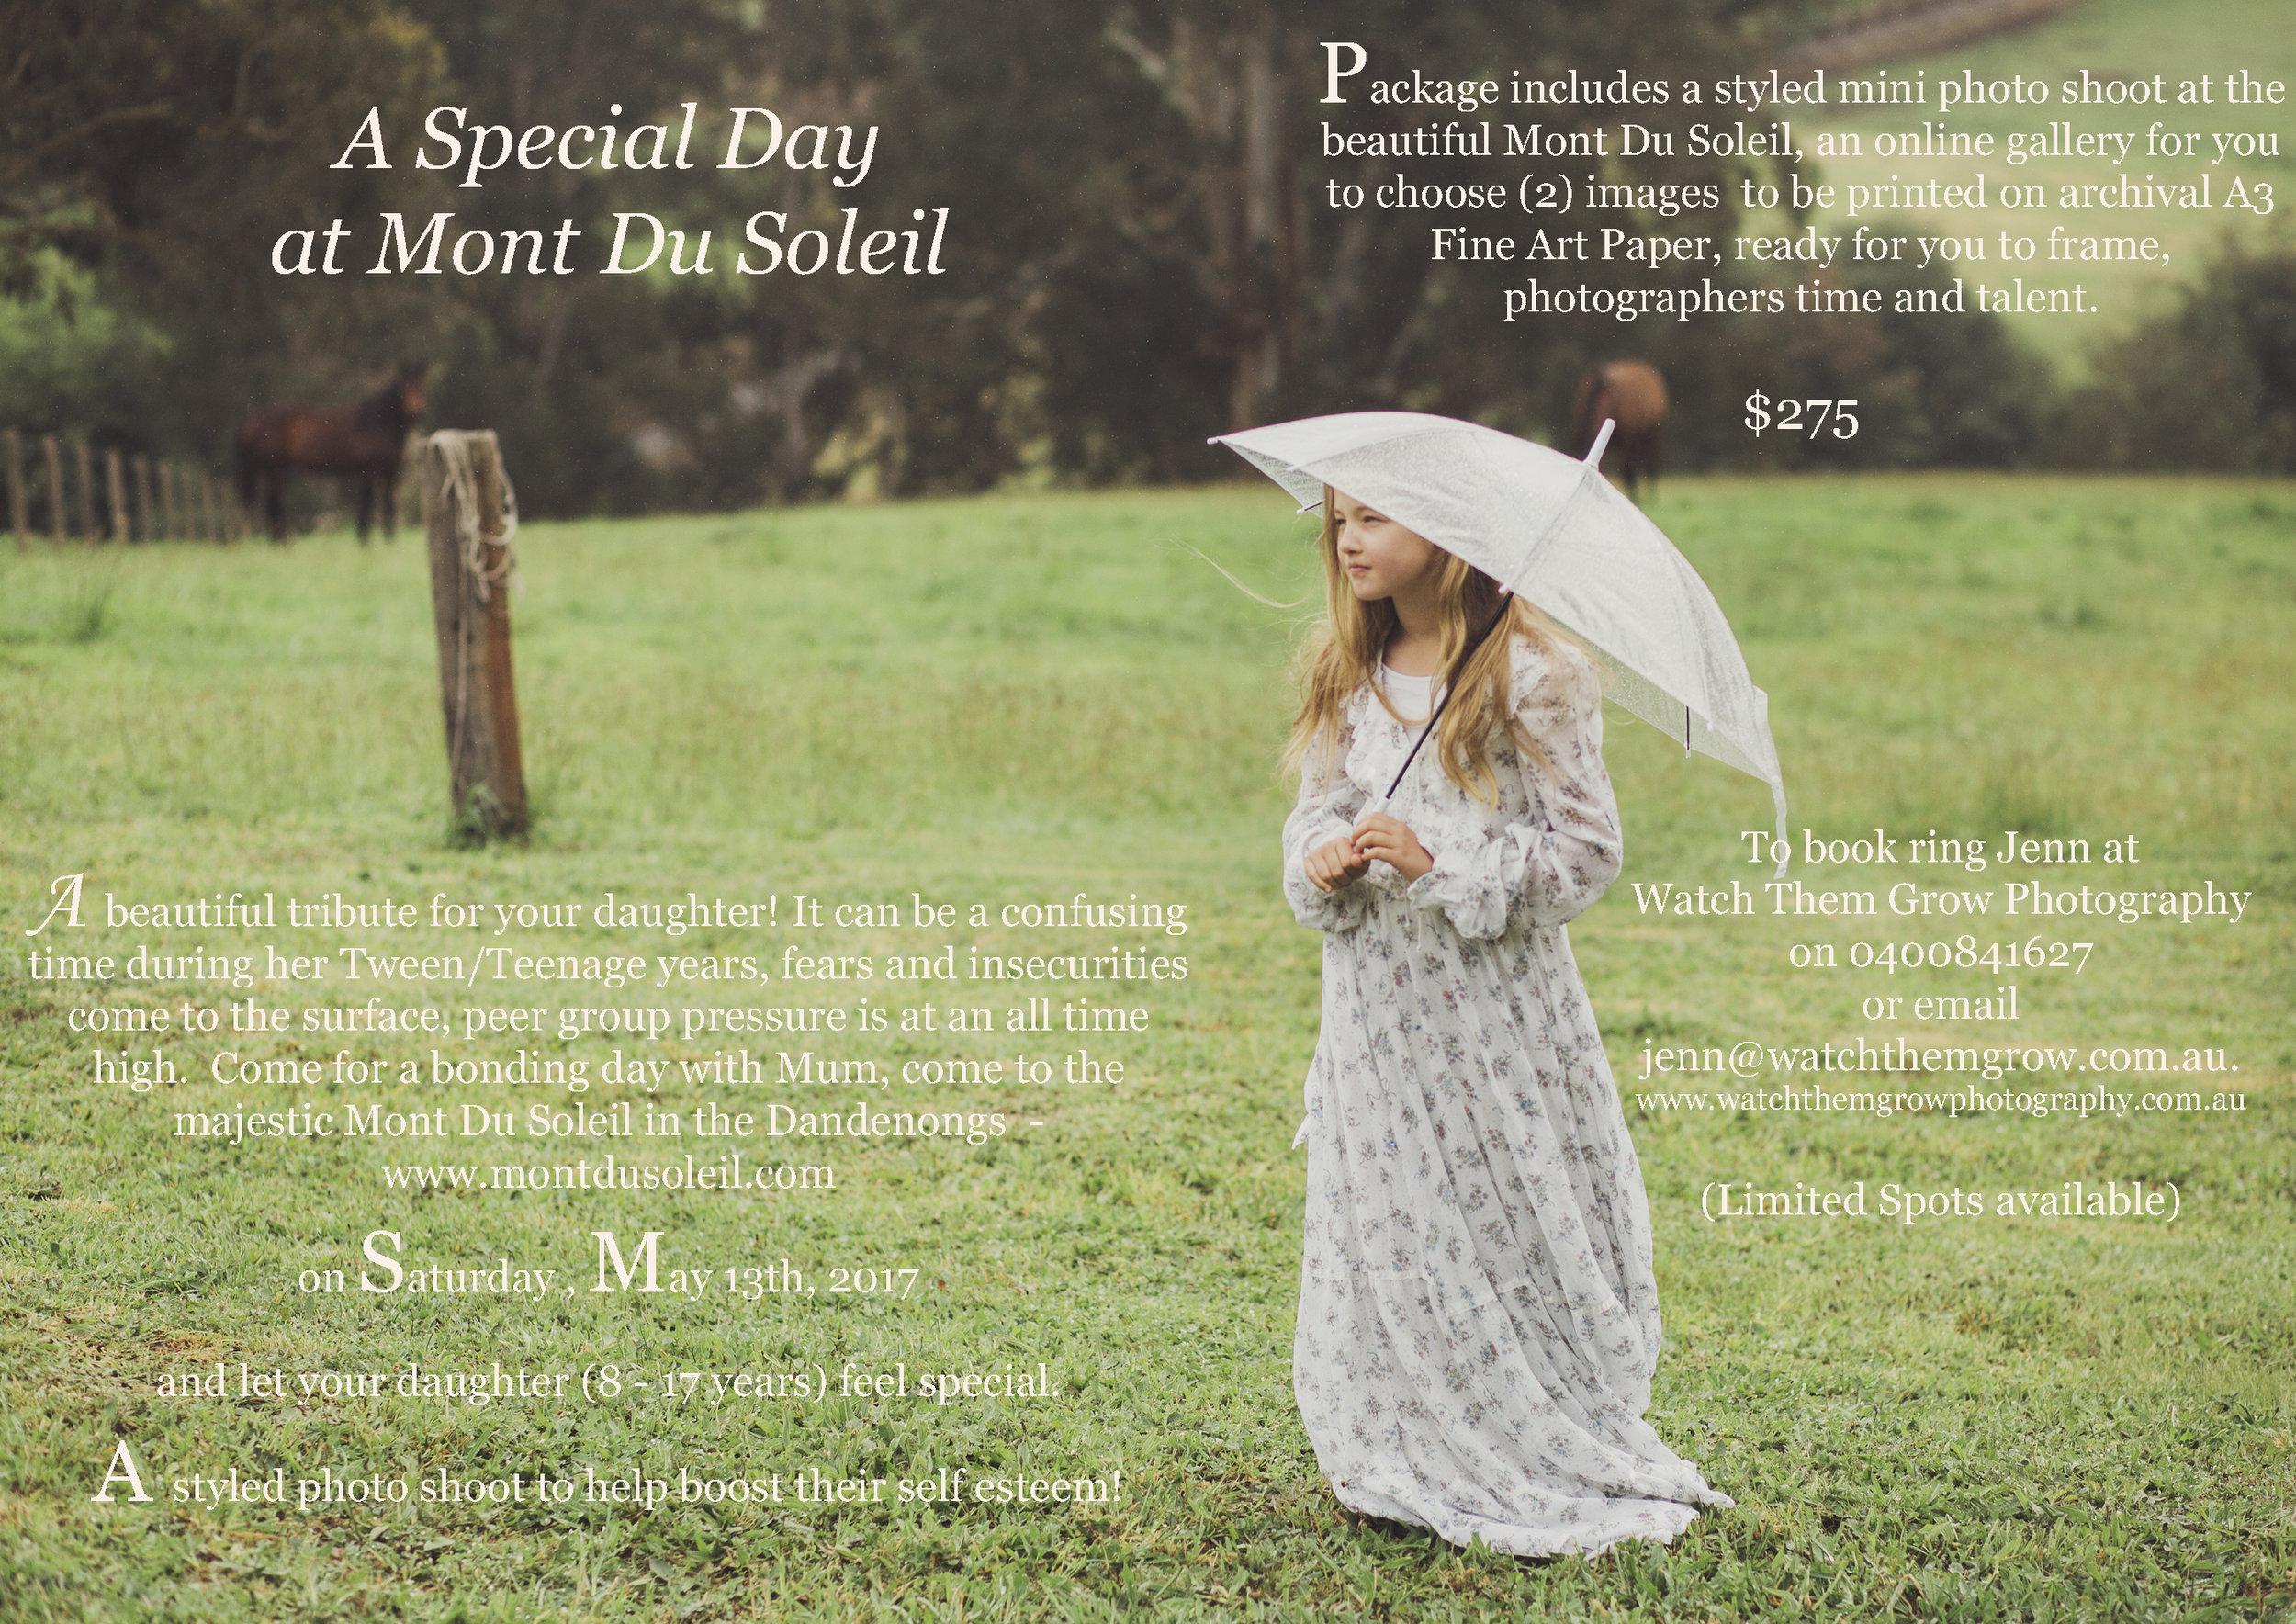 Mont Du Soleil Flyer May, 2017.jpg